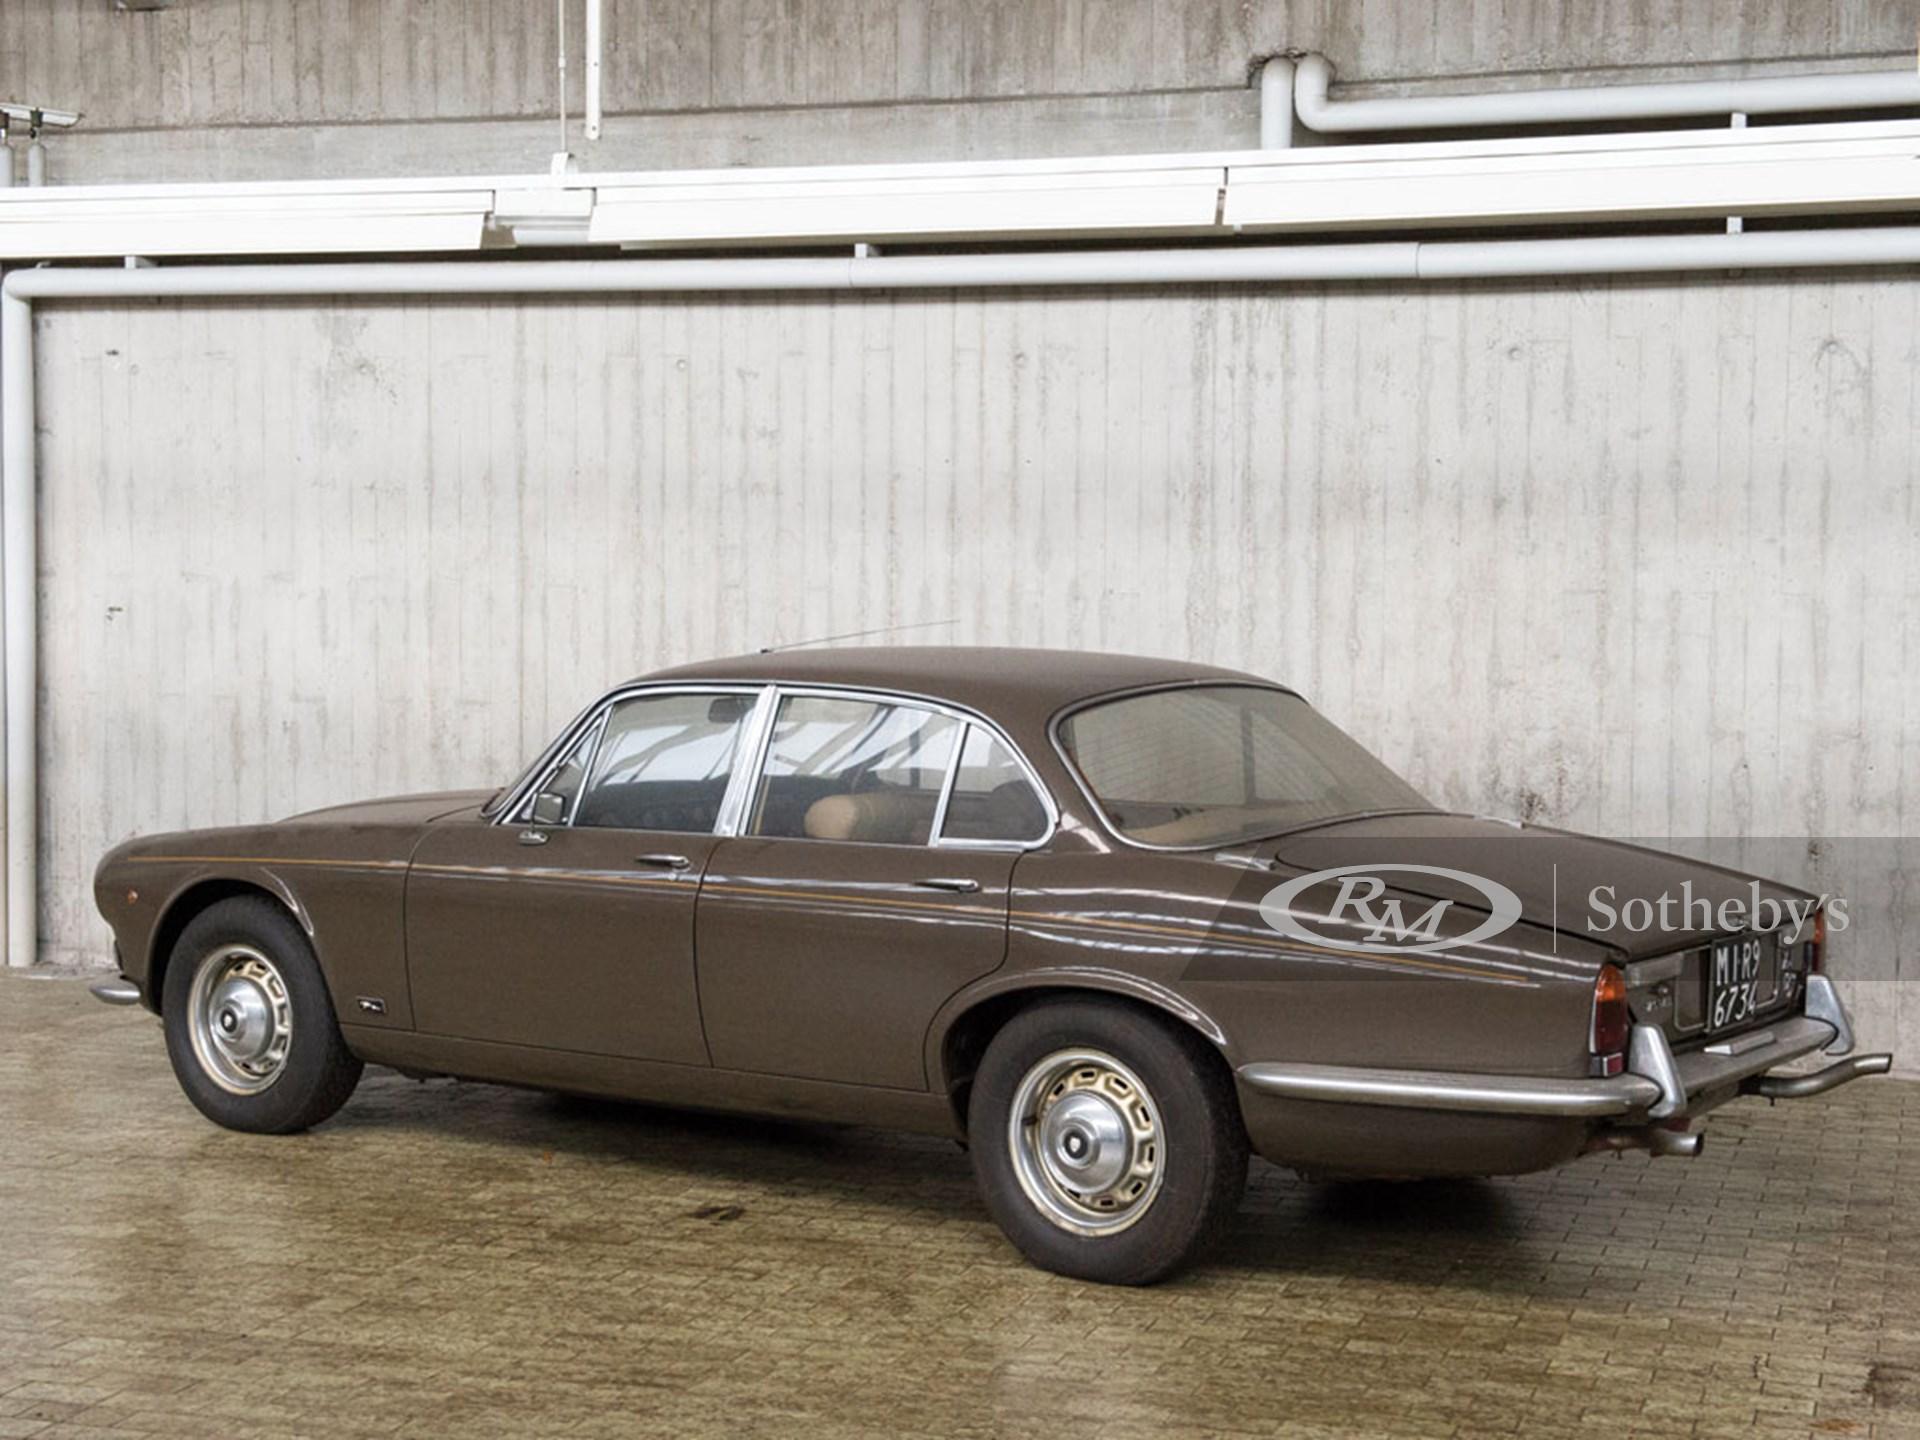 1972 Jaguar XJ12 SWB | Duemila Ruote 2016 | RM Auctions